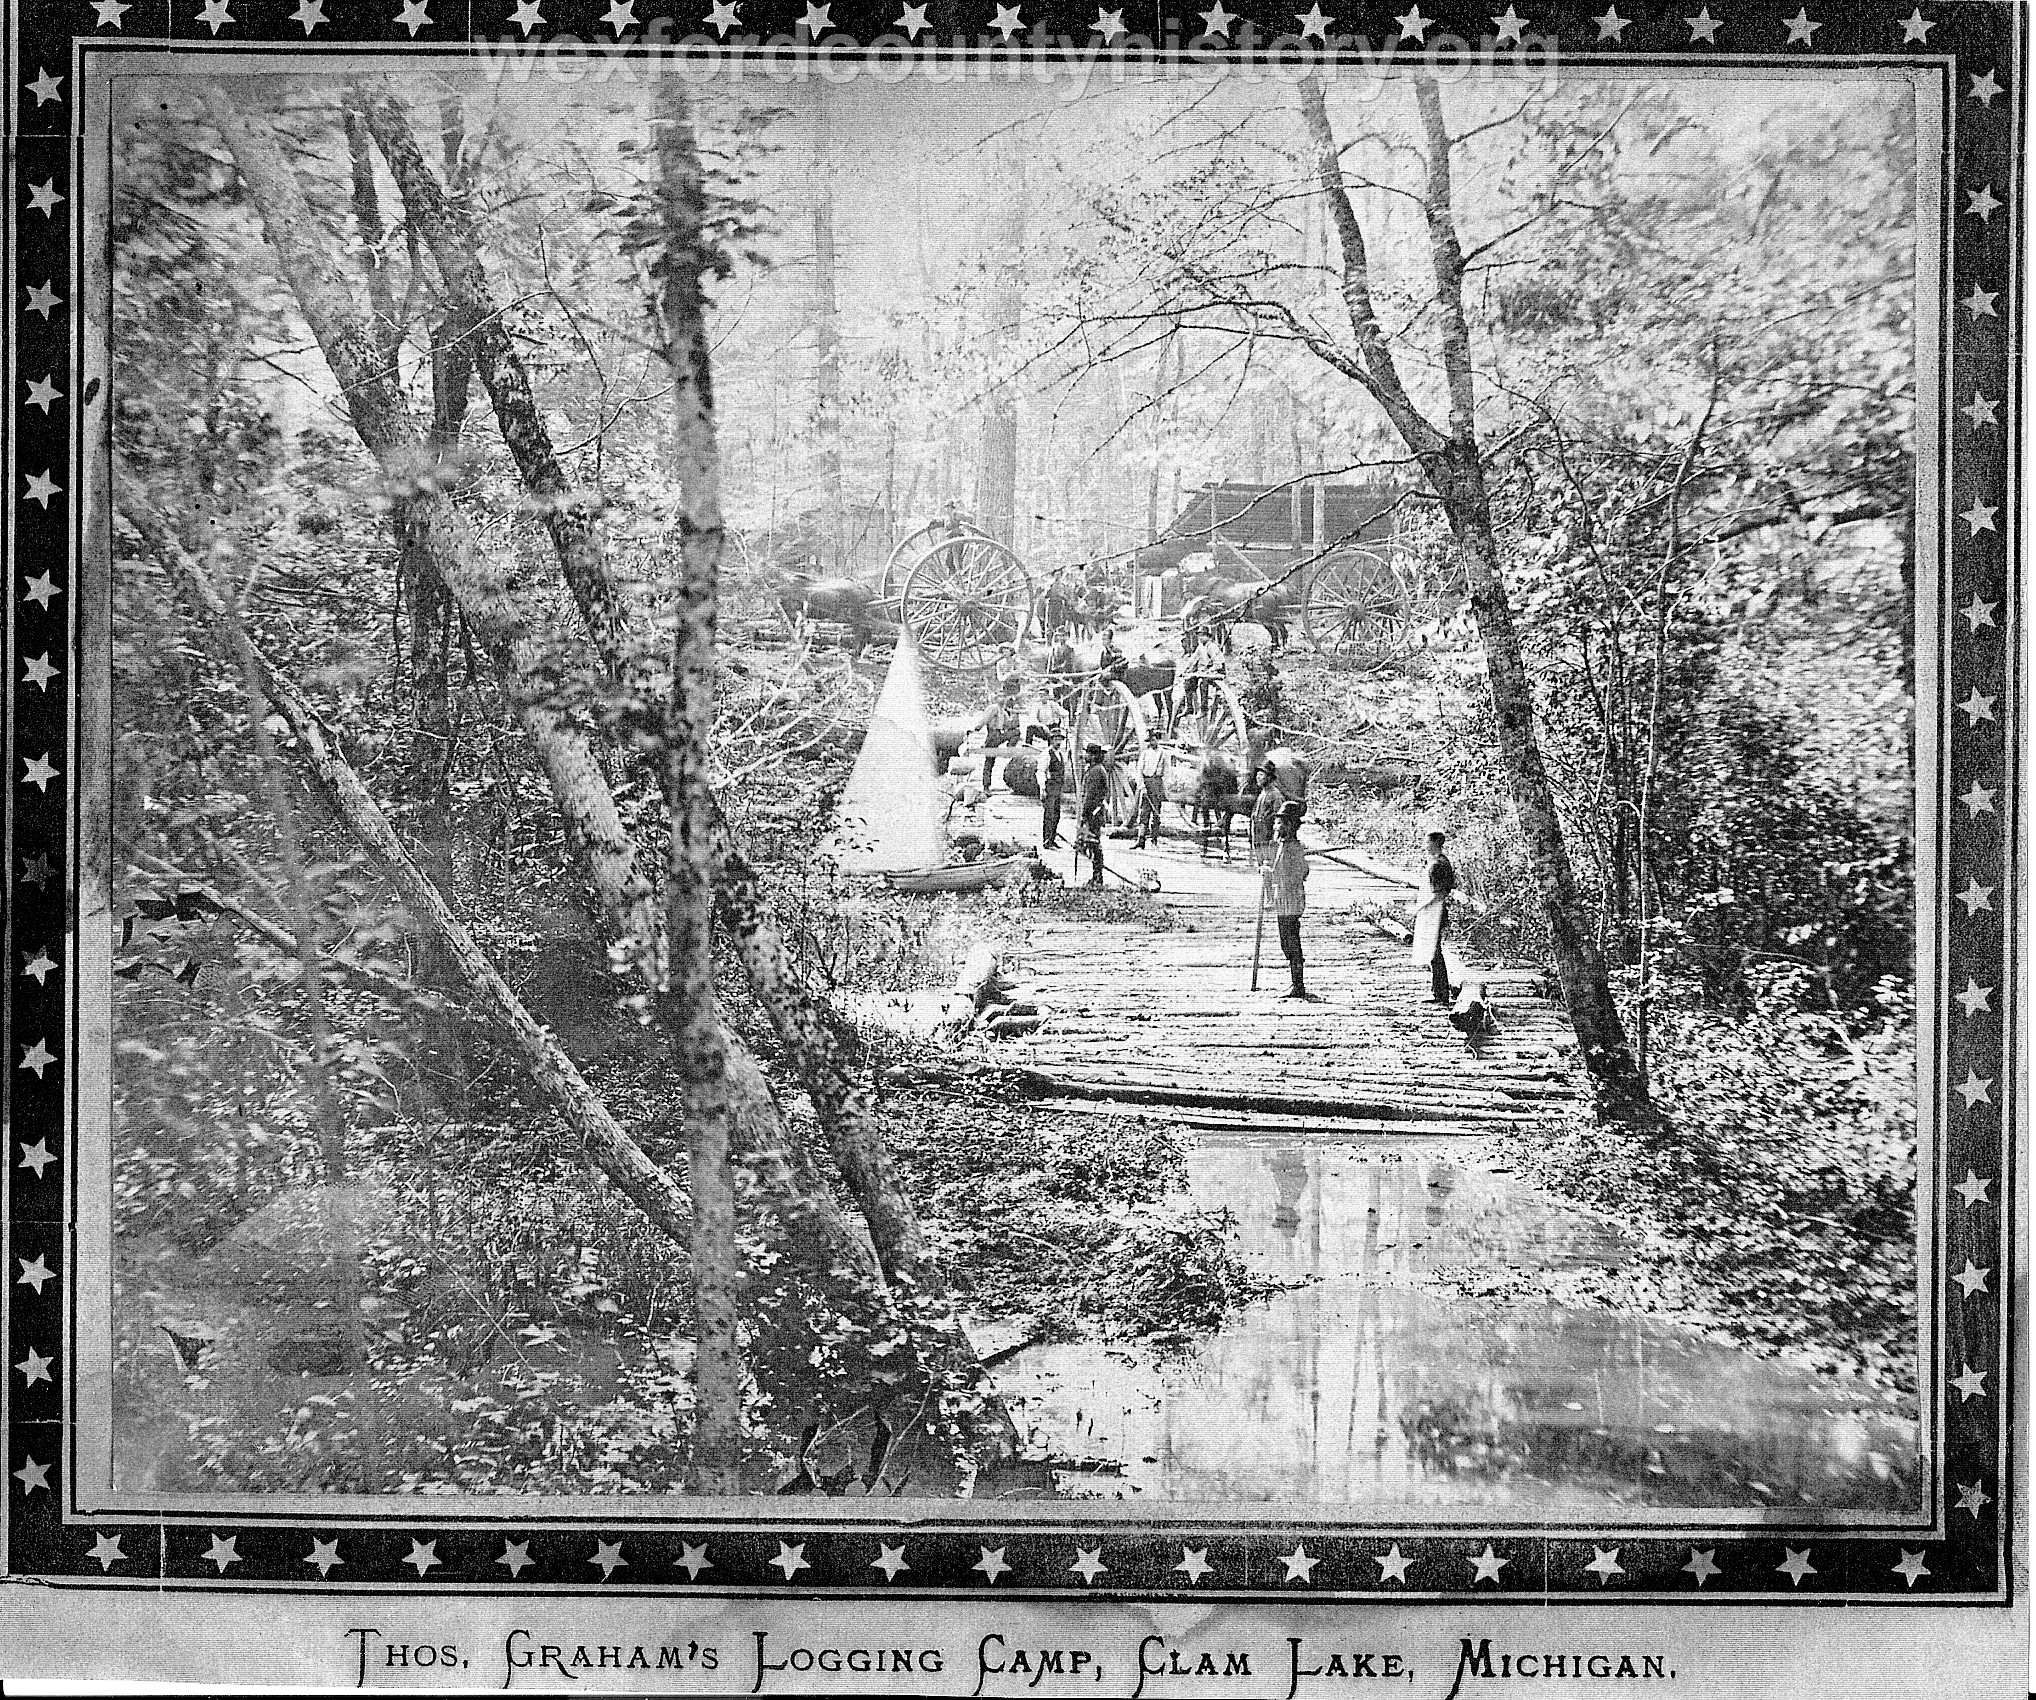 Cadillac-Lumber-Grahams-Logging-Camp